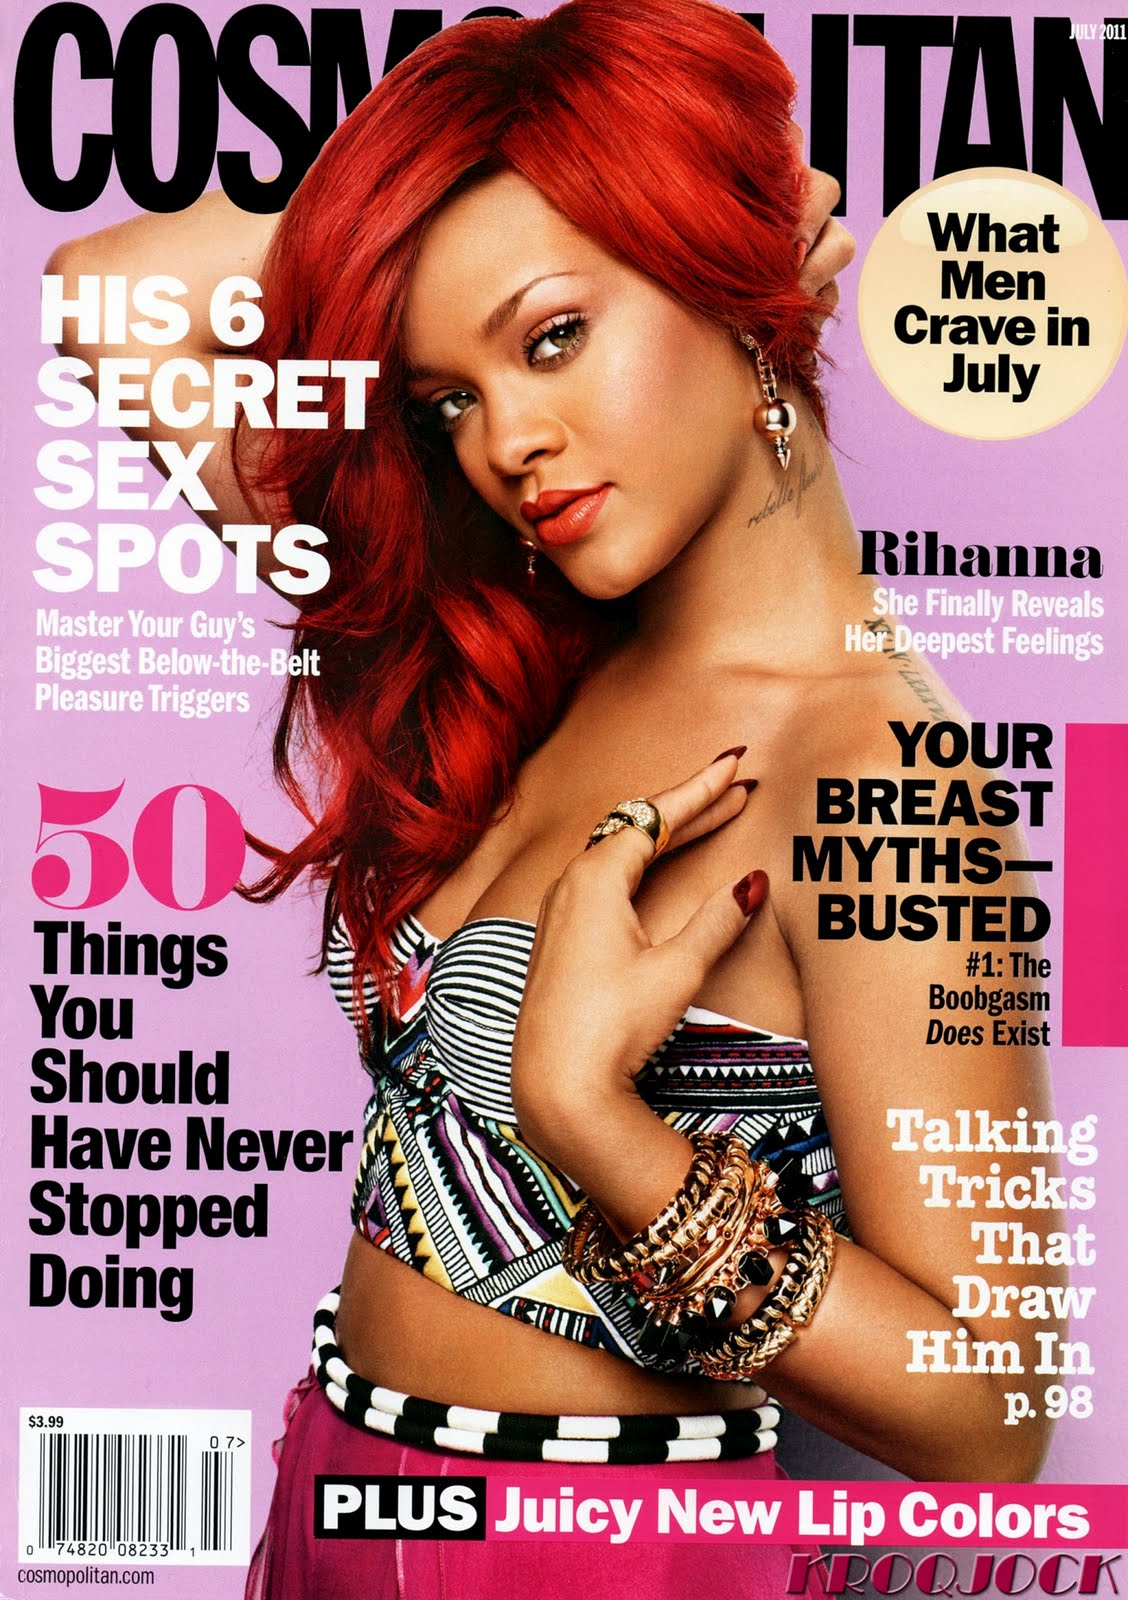 http://1.bp.blogspot.com/-mxpXTiq7aXg/TeUQRh064VI/AAAAAAAAAkA/-7fRTcTFFnM/s1600/Rihanna-138.jpg